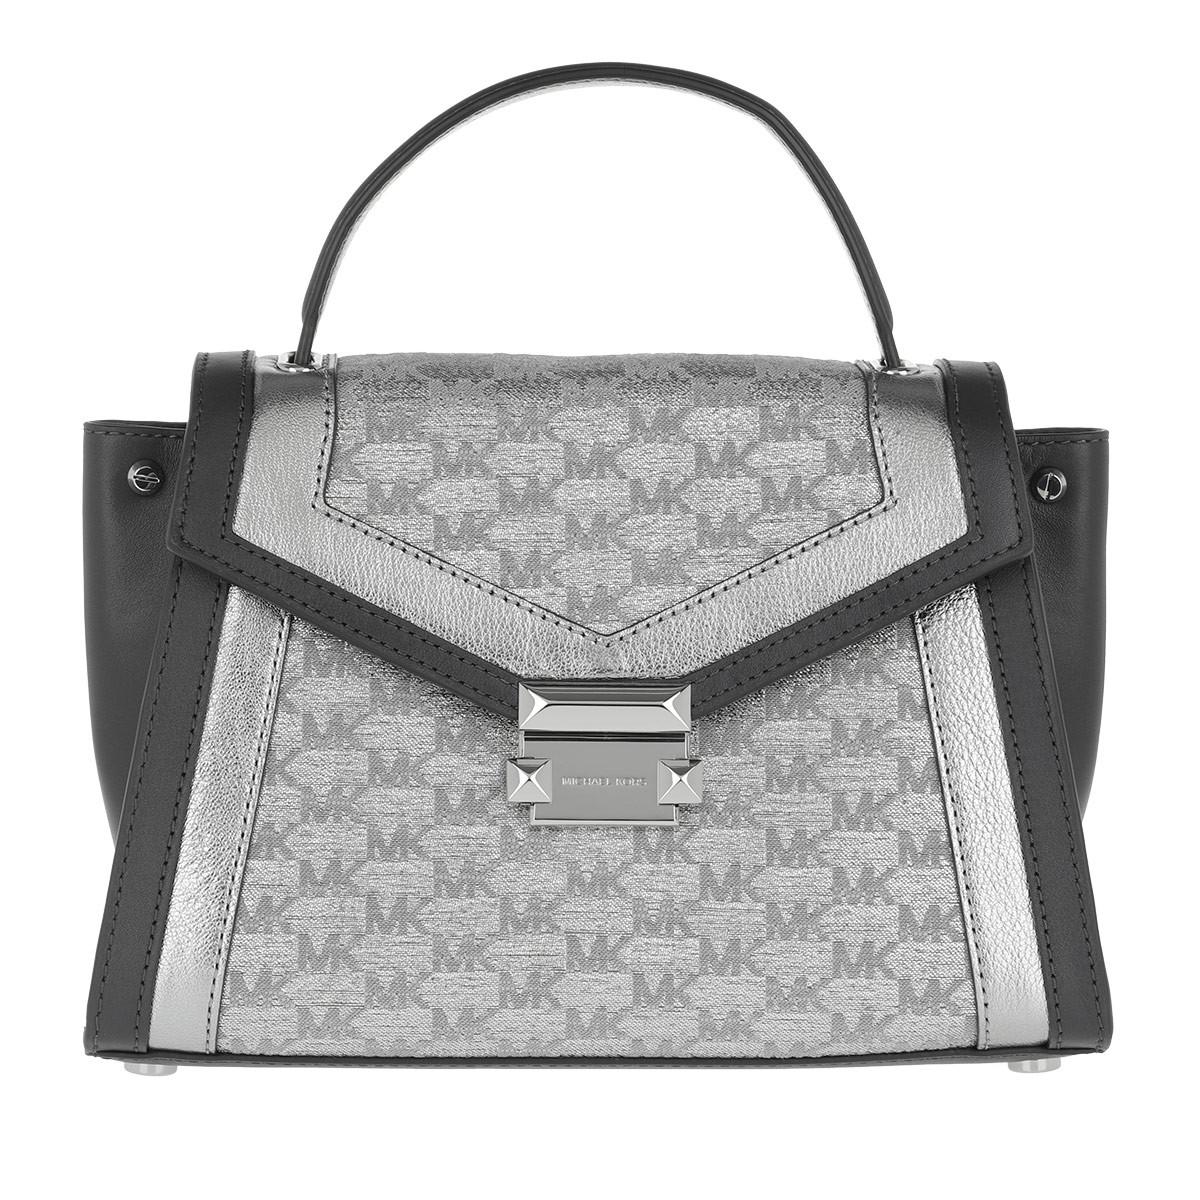 Michael Kors Satchel Bag - Whitney MD TH Satchel Bag Silver - in grau - für Damen